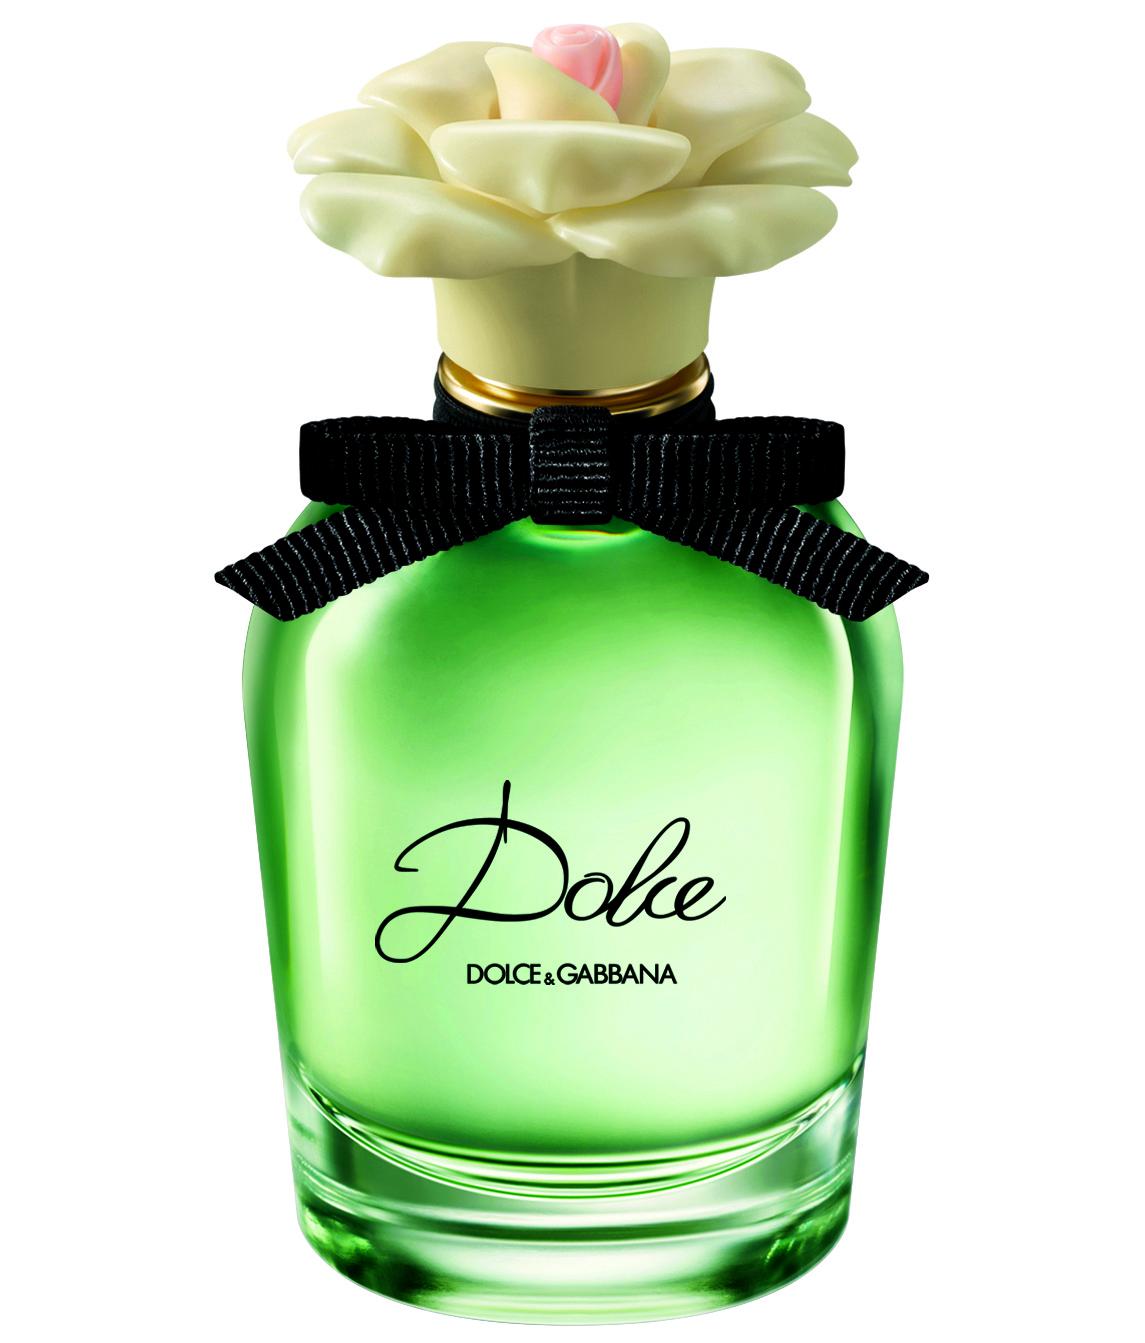 "Parfym, Dolce & Gabbana, ""Dolce"" Eau de Perfume, 50 ml, 890 kr"